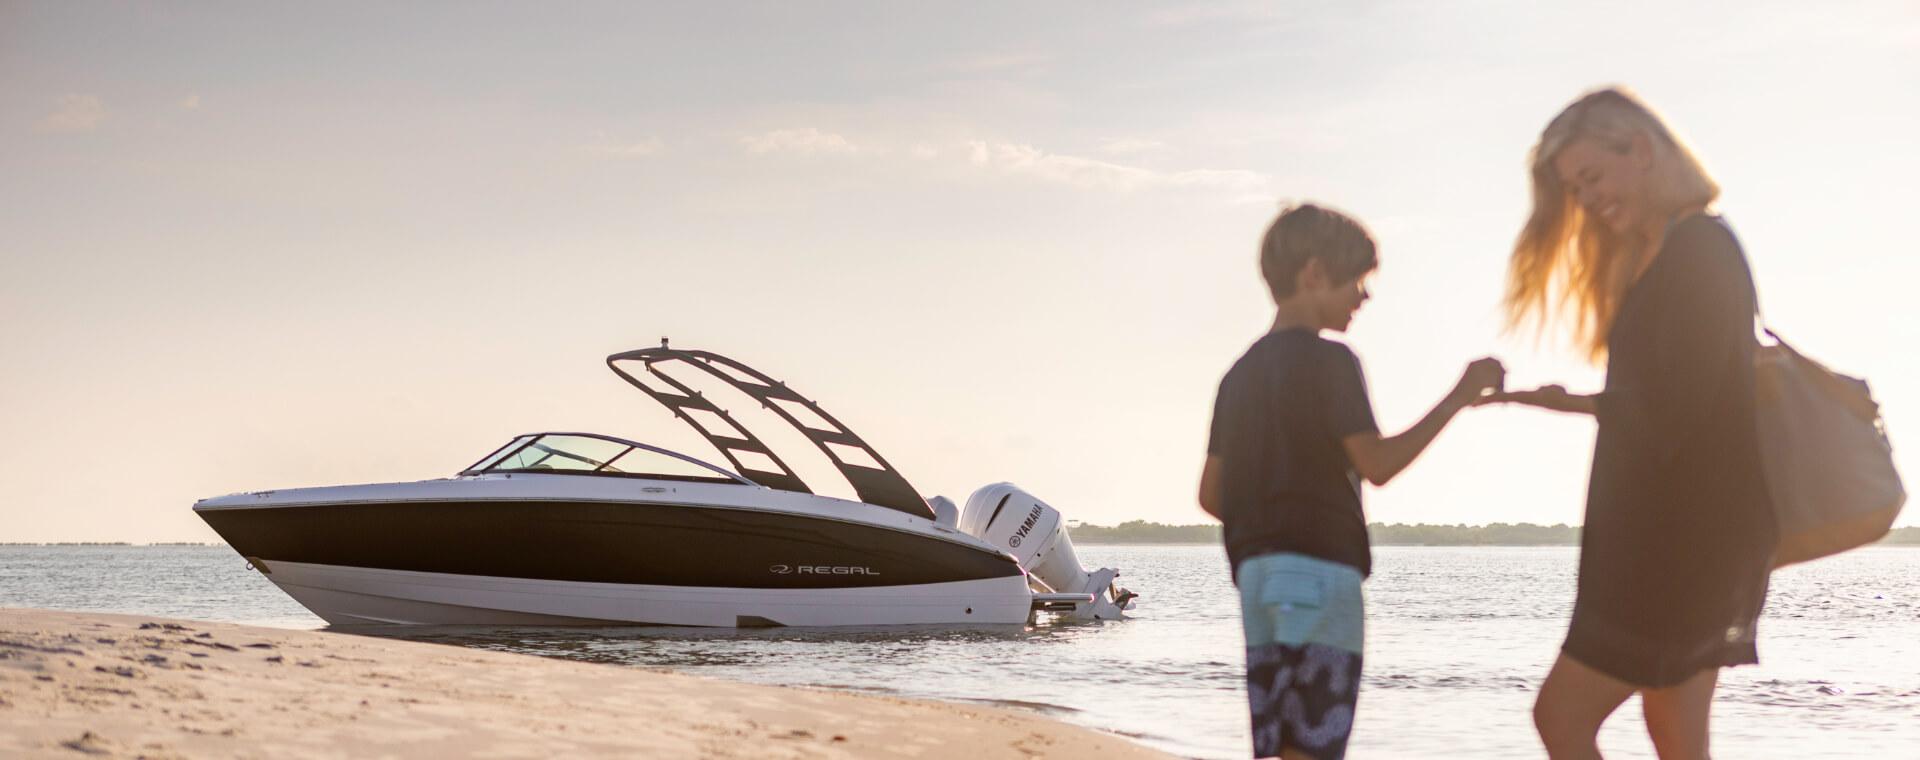 CSB Marine - Achat bateaux occasion